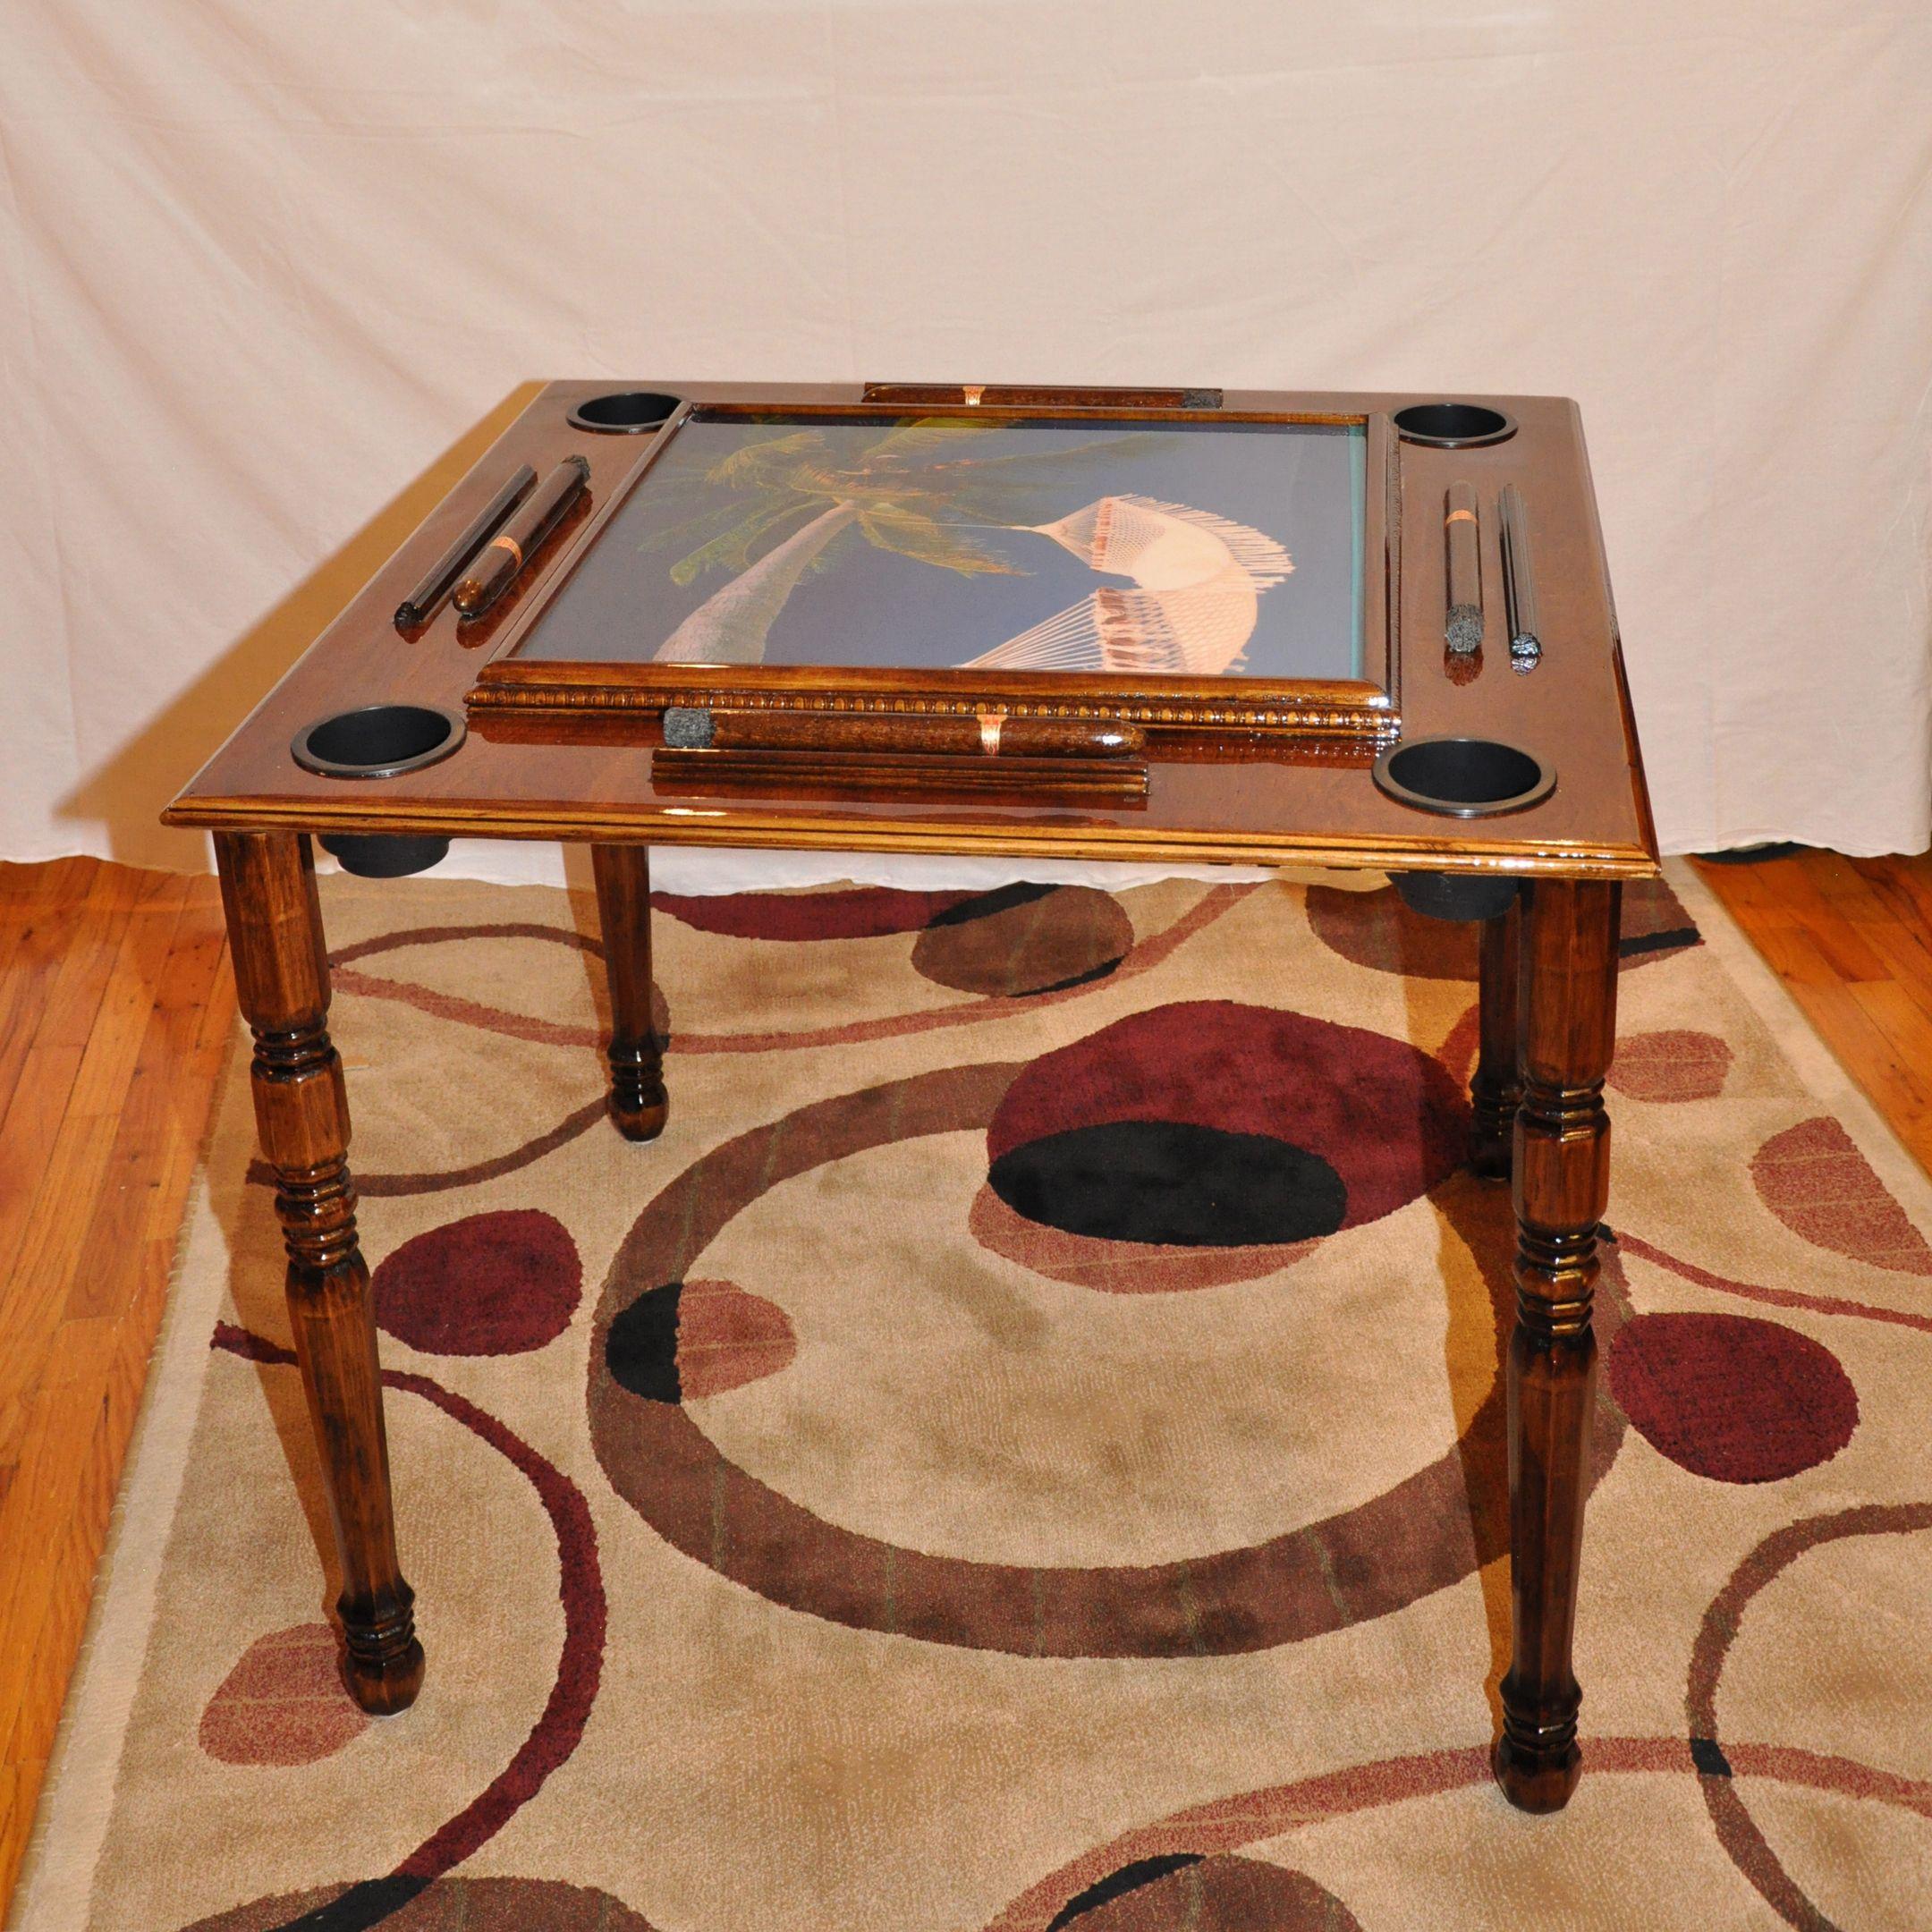 Surprising Pin On Tablas Capicubana Domino Tables Home Interior And Landscaping Ologienasavecom